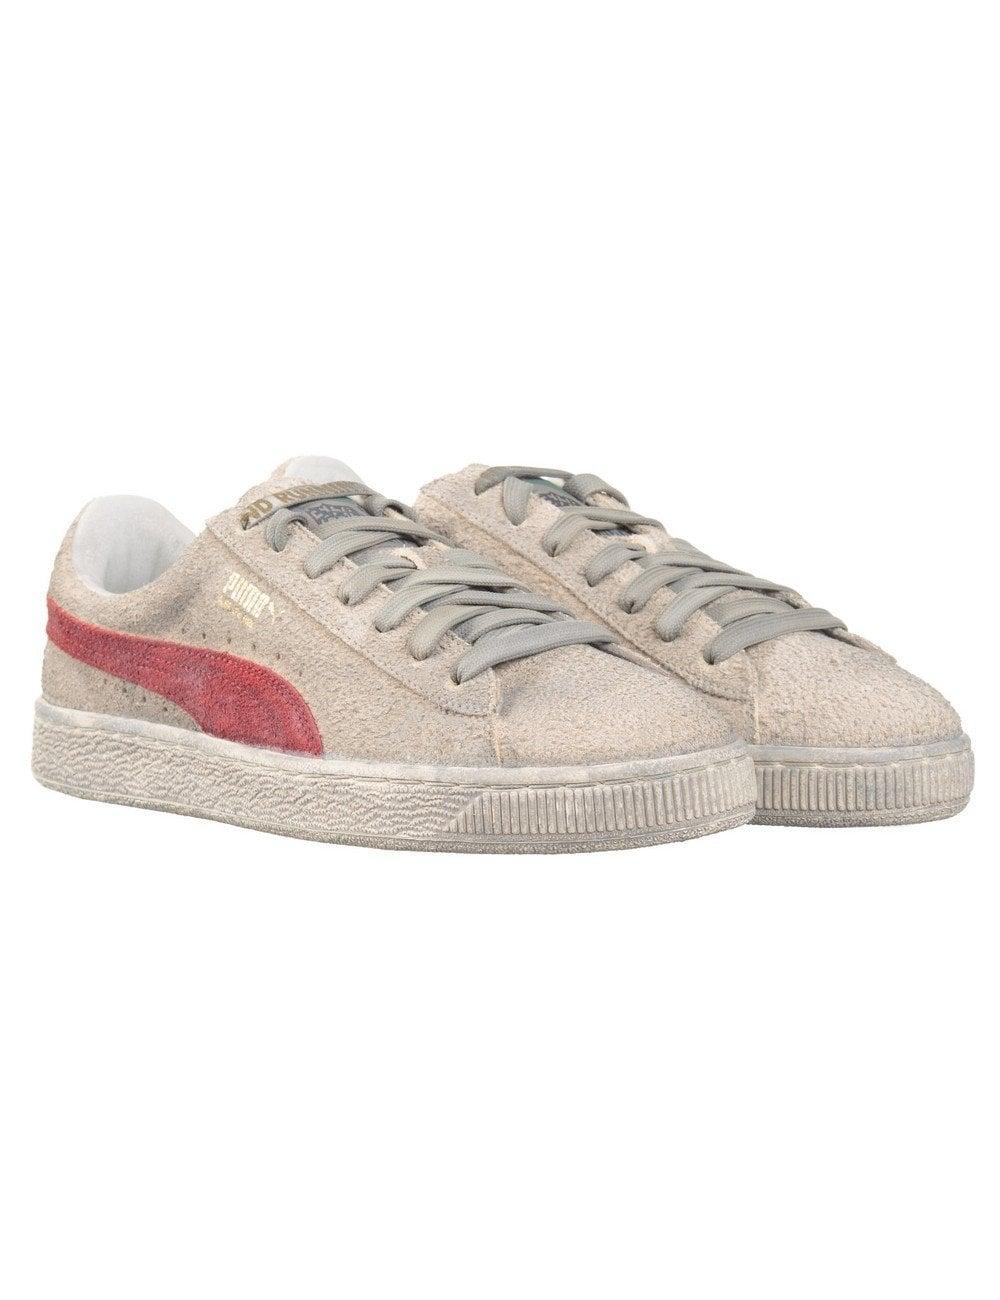 da91e075ce94 Puma x Alife Suede Shoes - Whisper White Amazon - Footwear from Fat ...